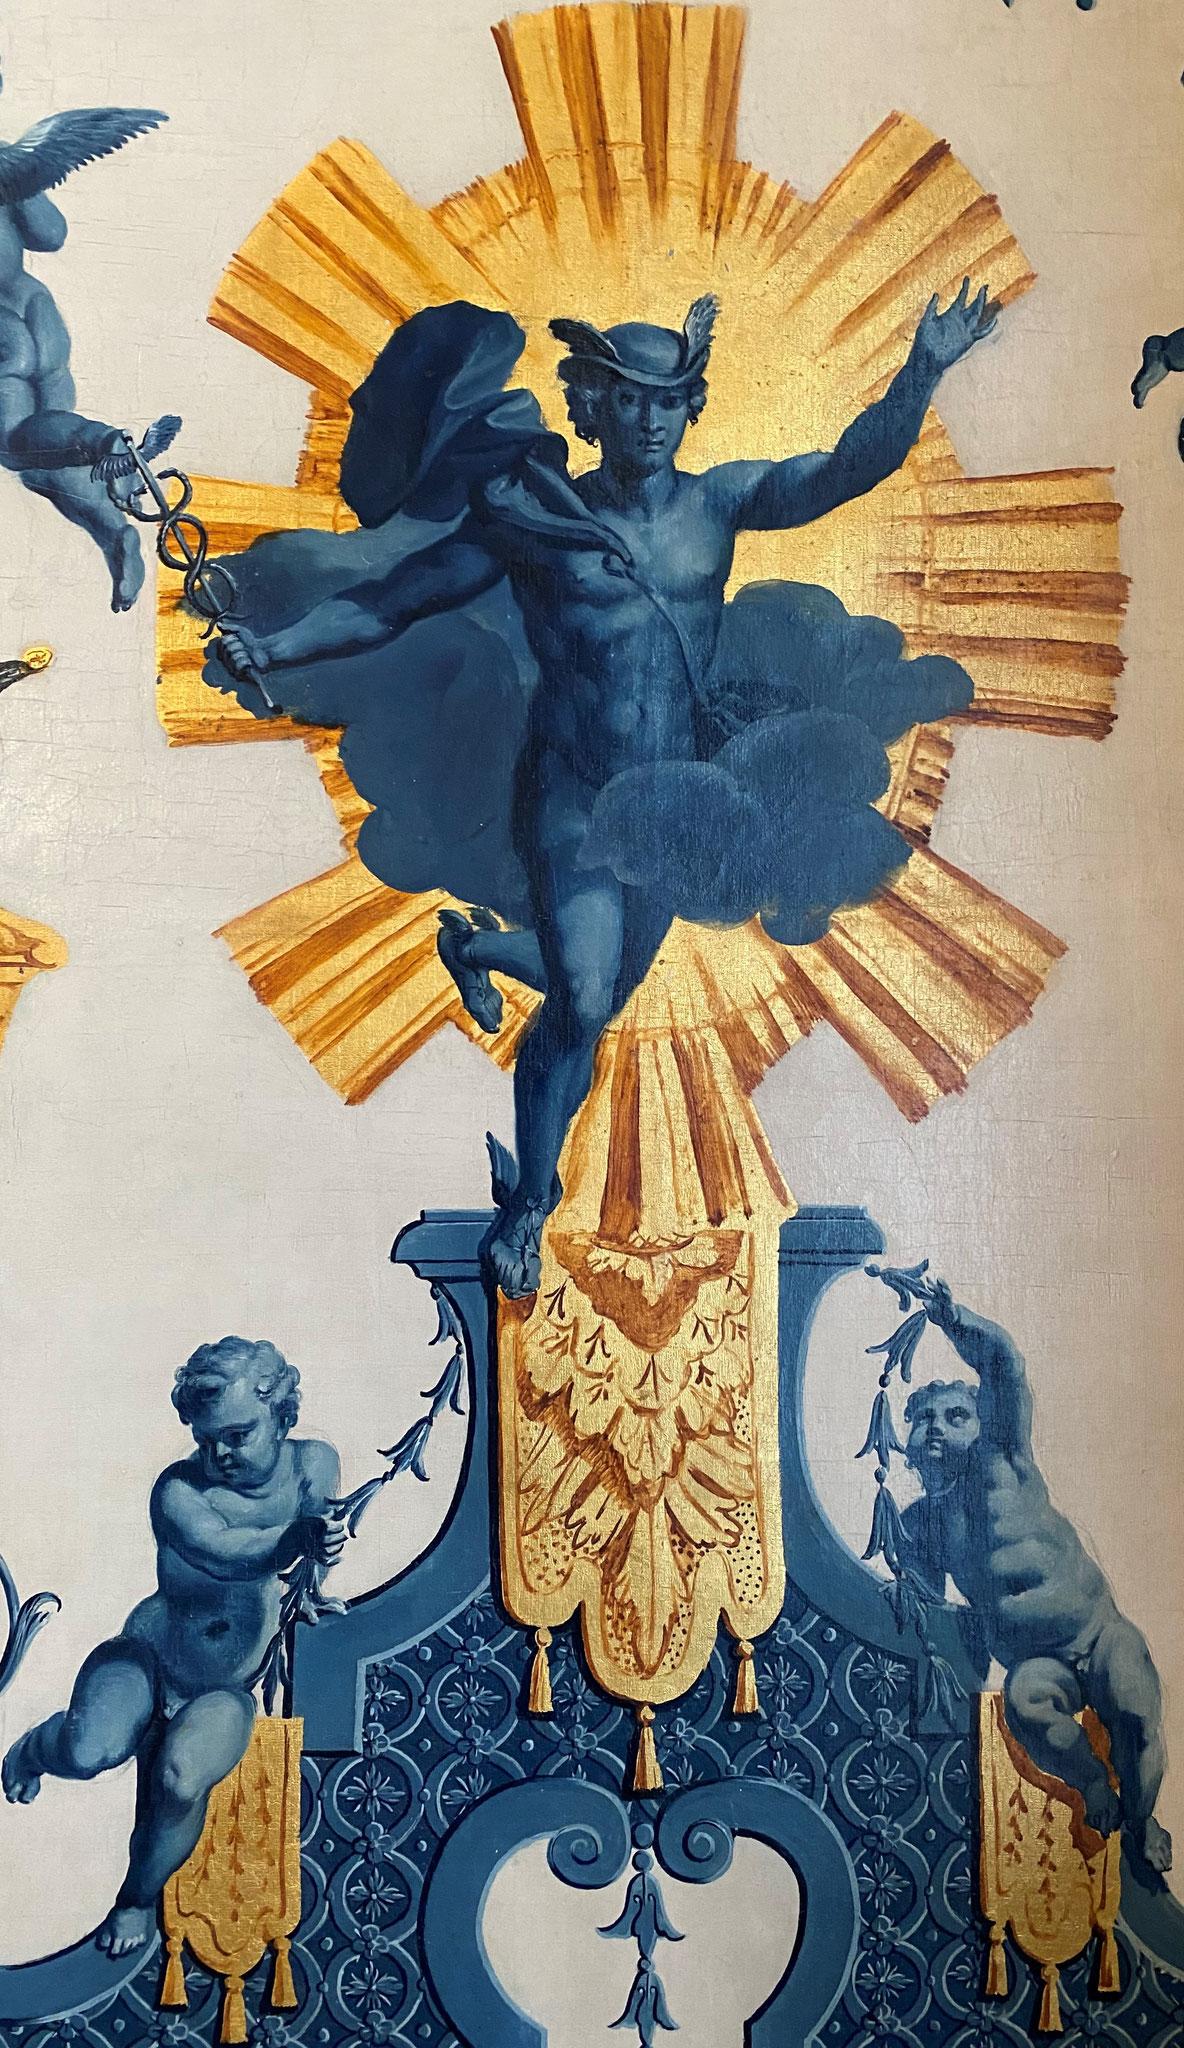 Merkur / Hermes